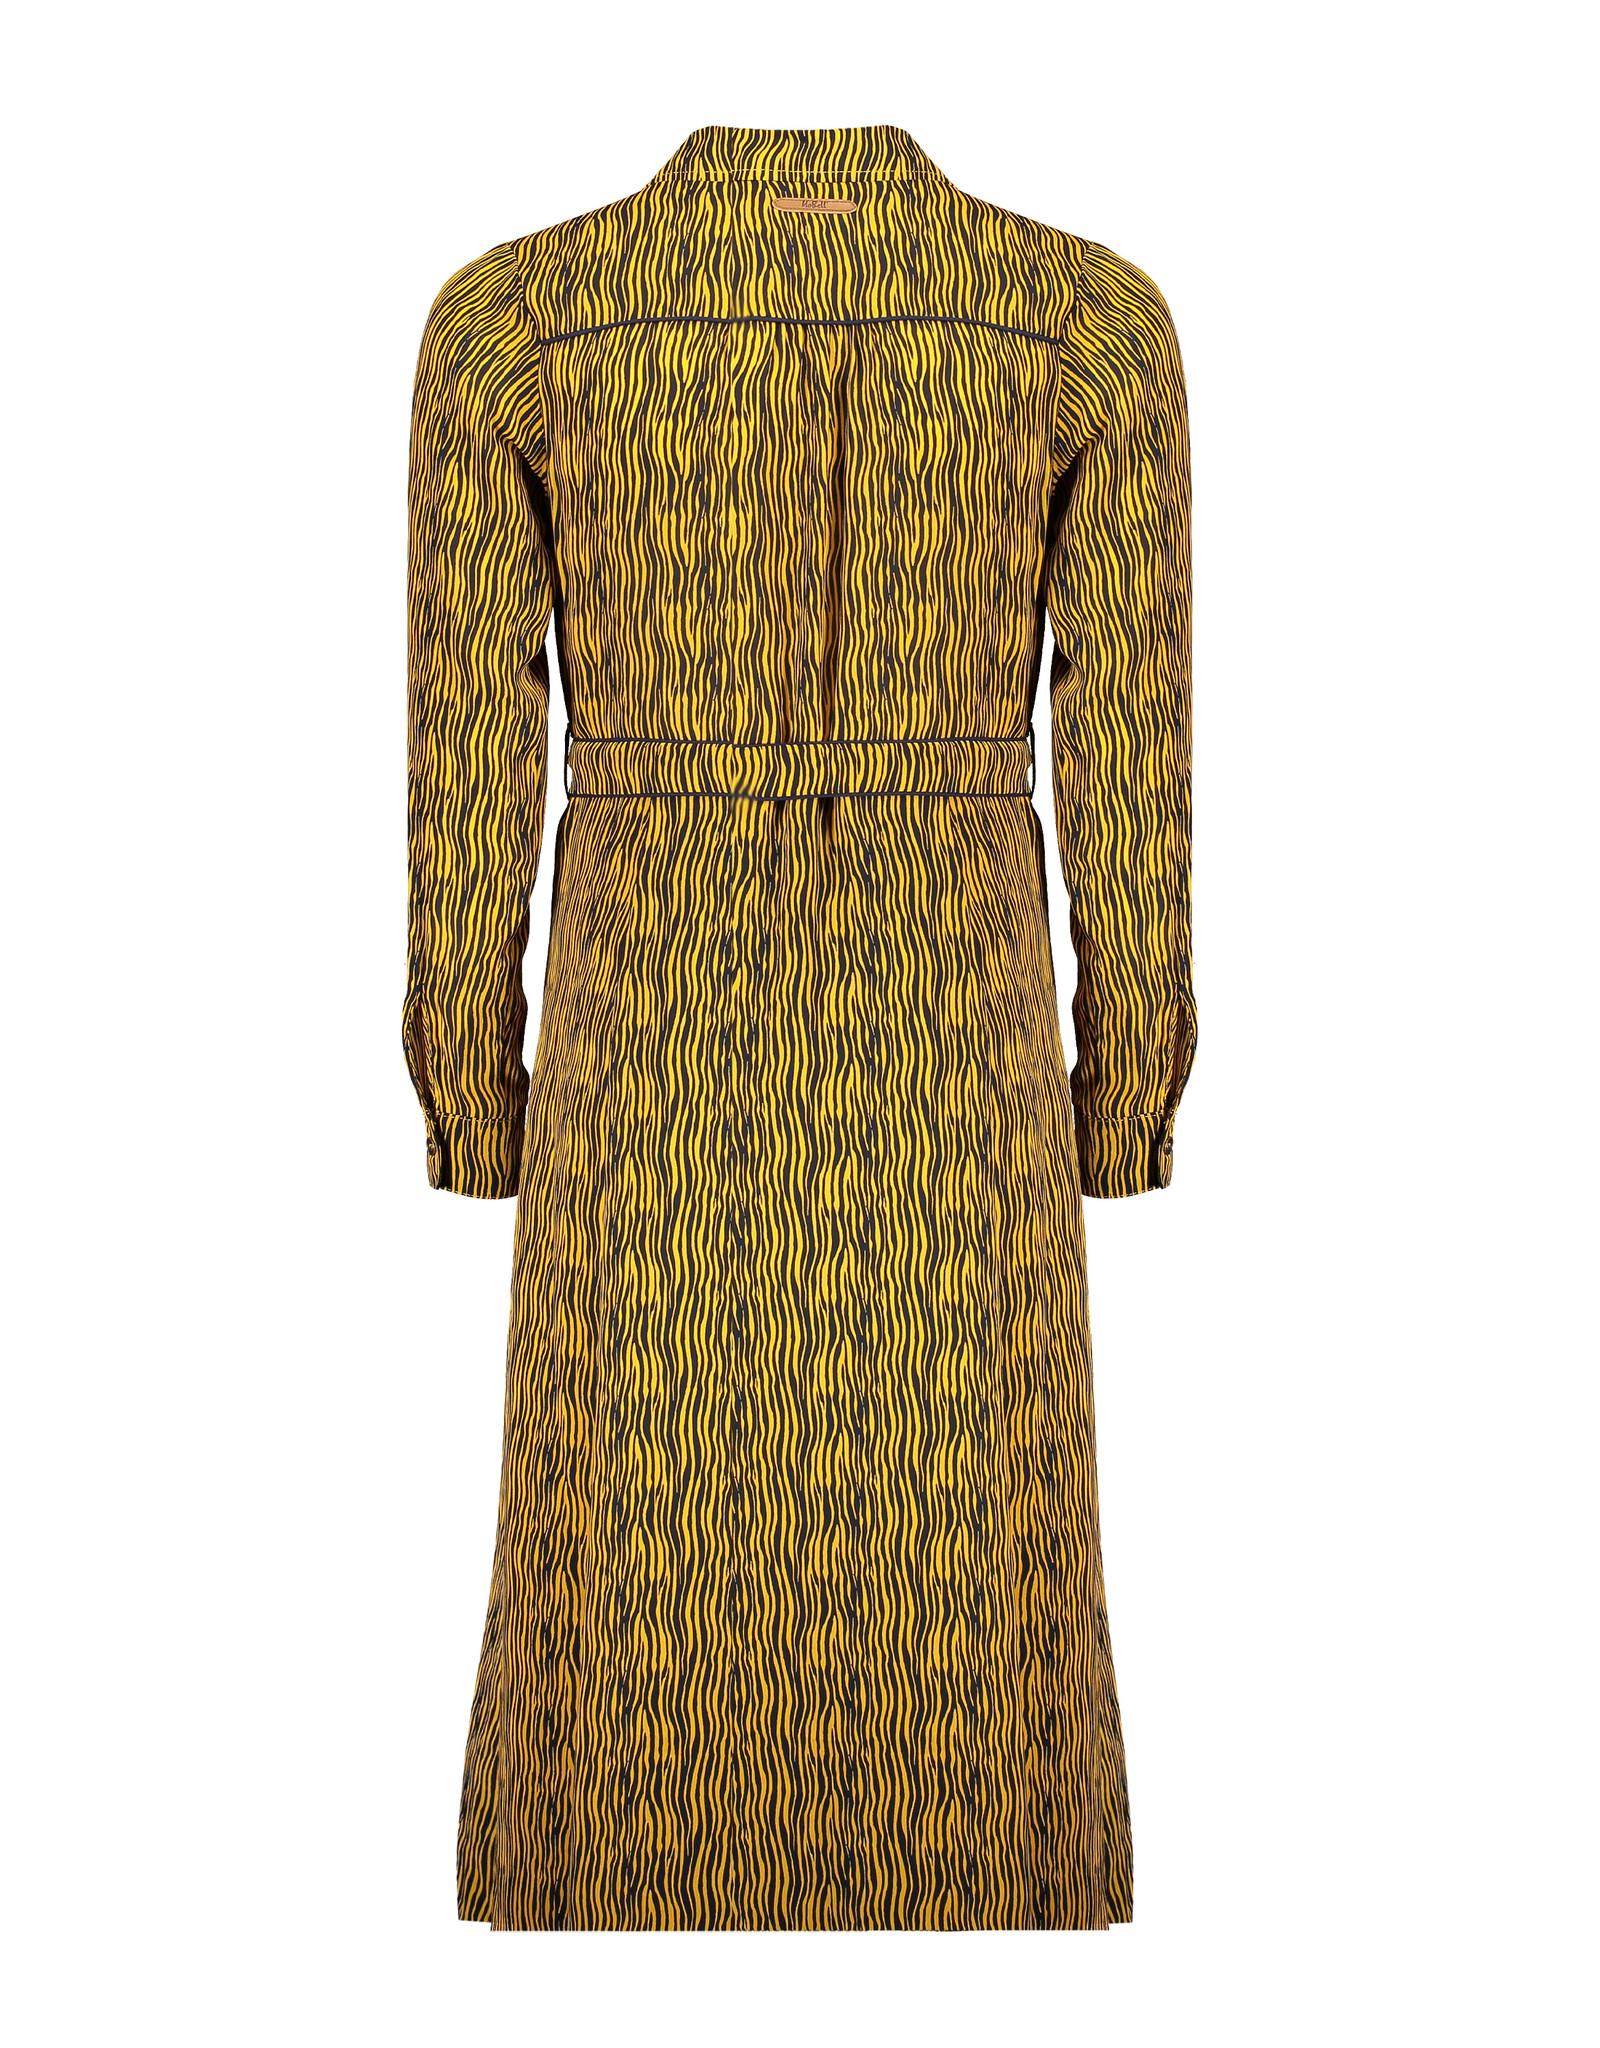 NoBell NoBell Mulia maxi zebra all over print DRESS YELLOW GOLD